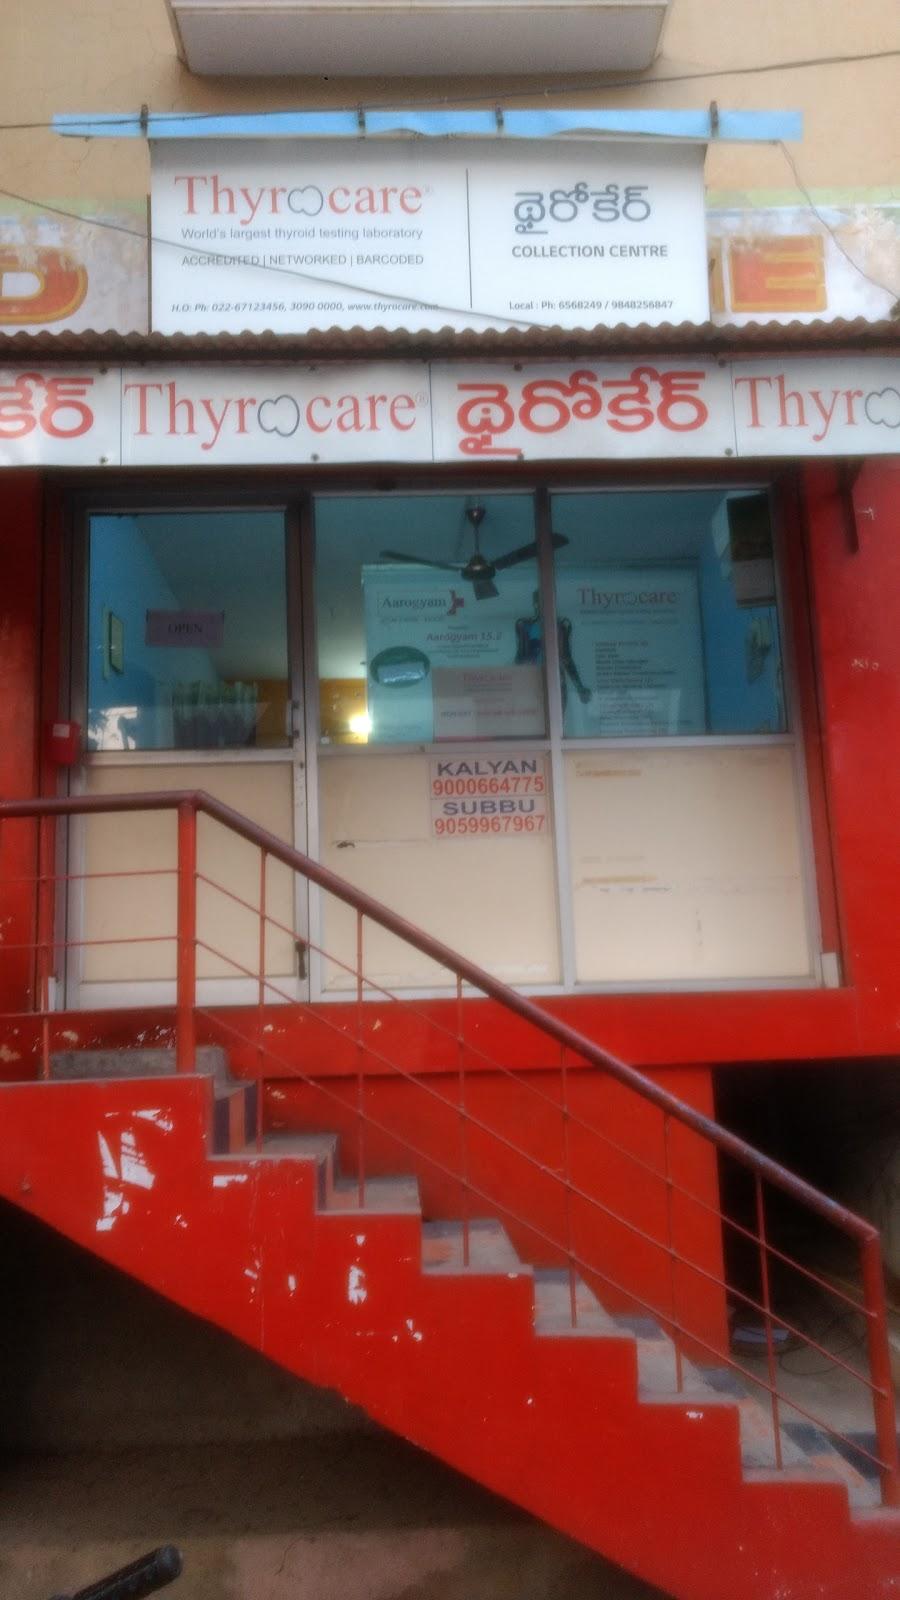 blood bank Thyrocare near Rajahmundry Andhra Pradesh